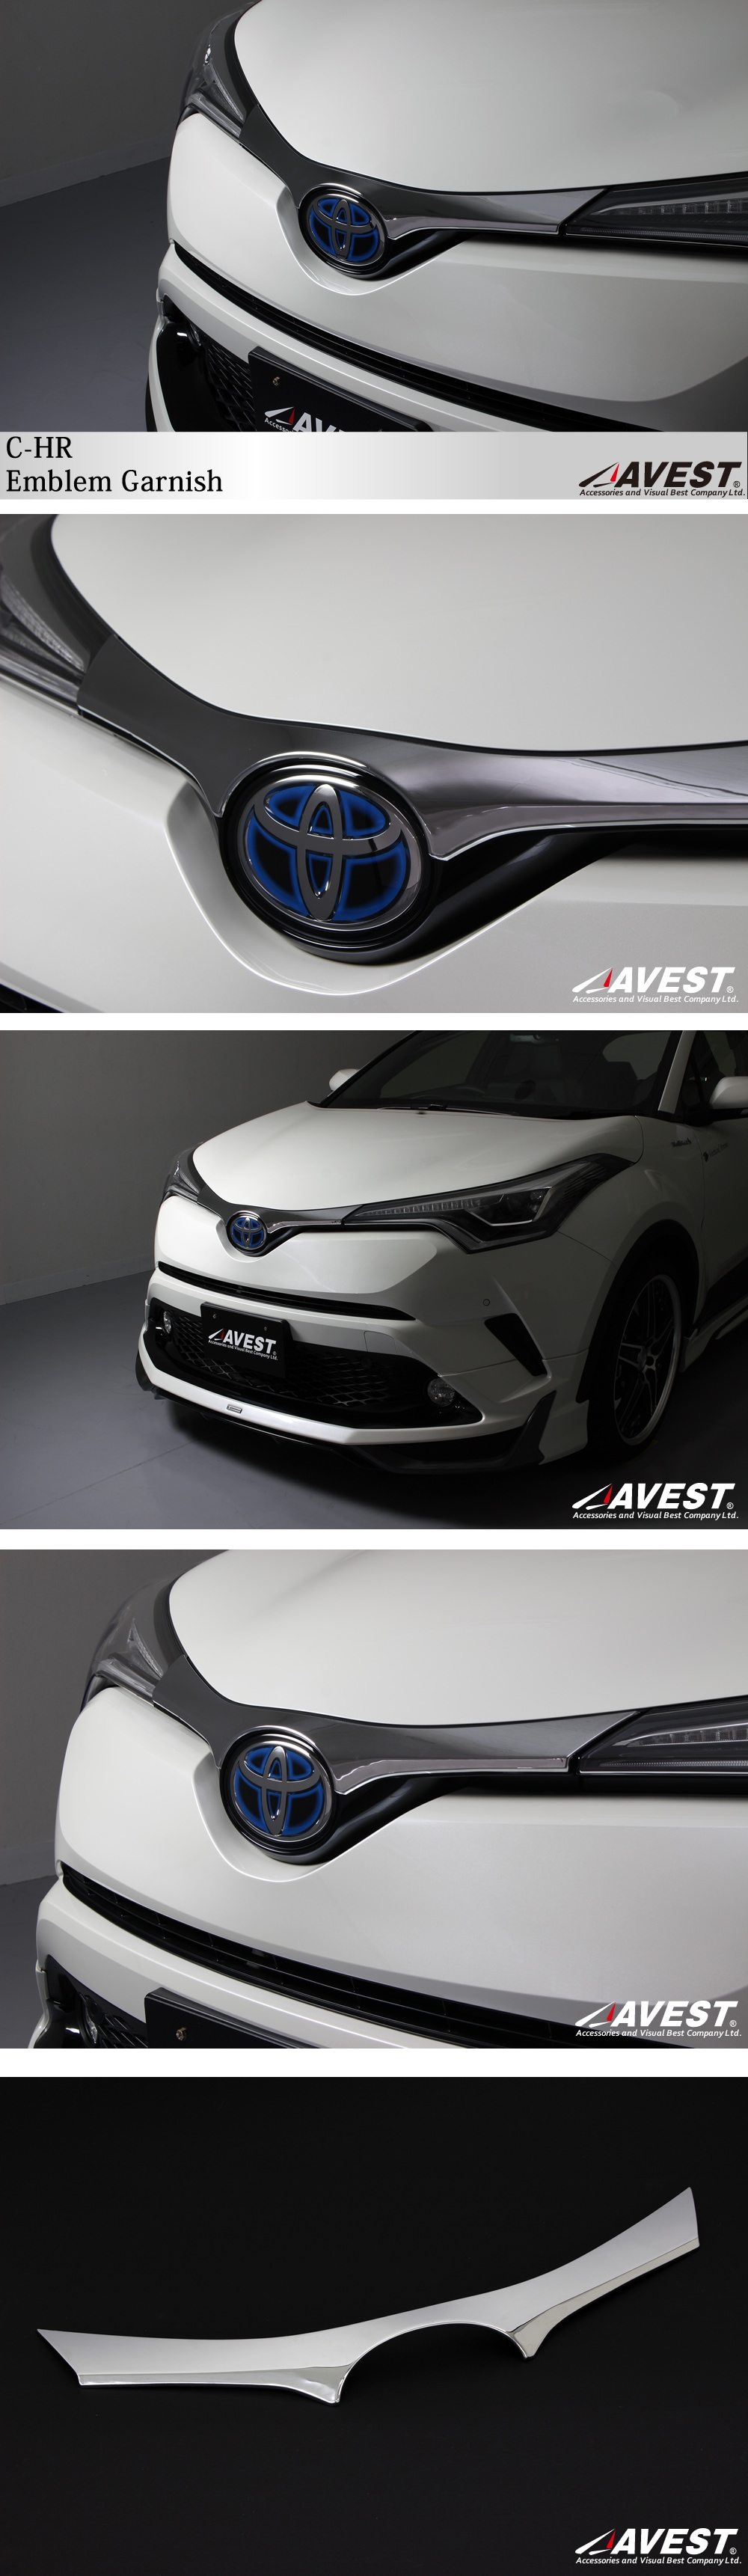 TOYOTA/C-HR/NGX50/ZYX10/エンブレム/ガーニッシュ/トヨタ/外装/メッキ/パーツ